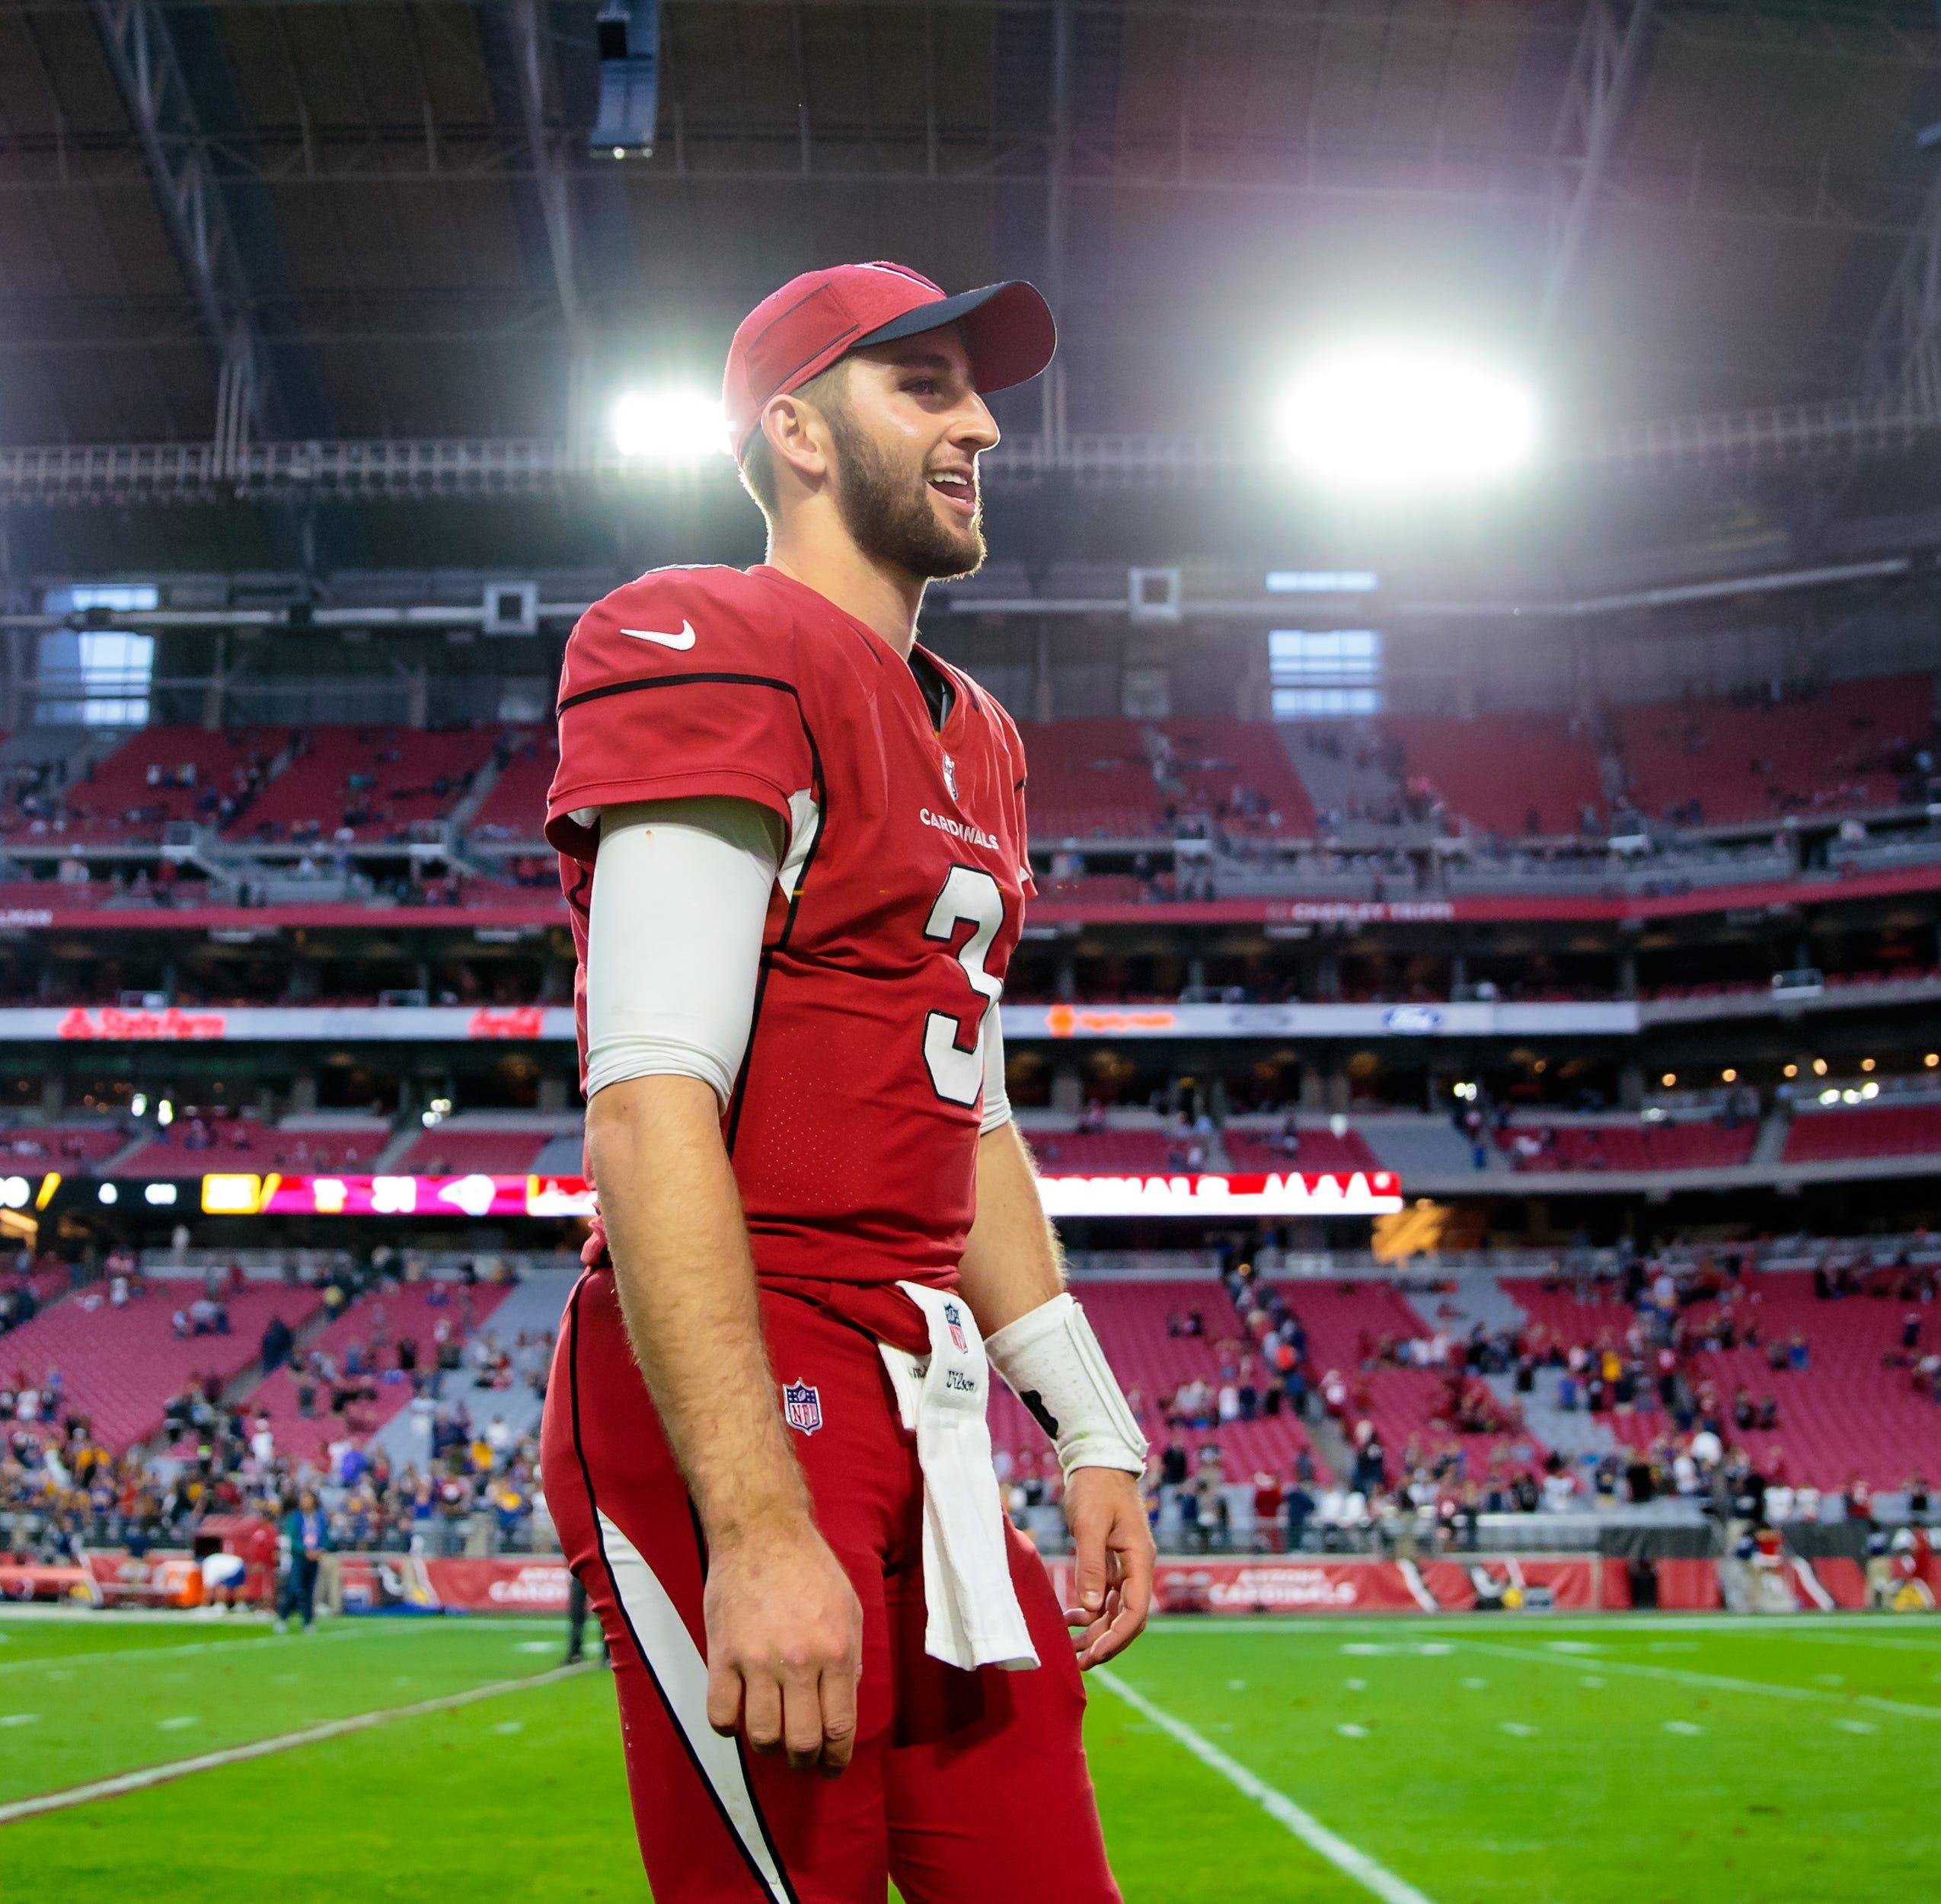 Josh Rosen trade rumors: Arizona Cardinals Kyler Murray NFL draft speculation heats up